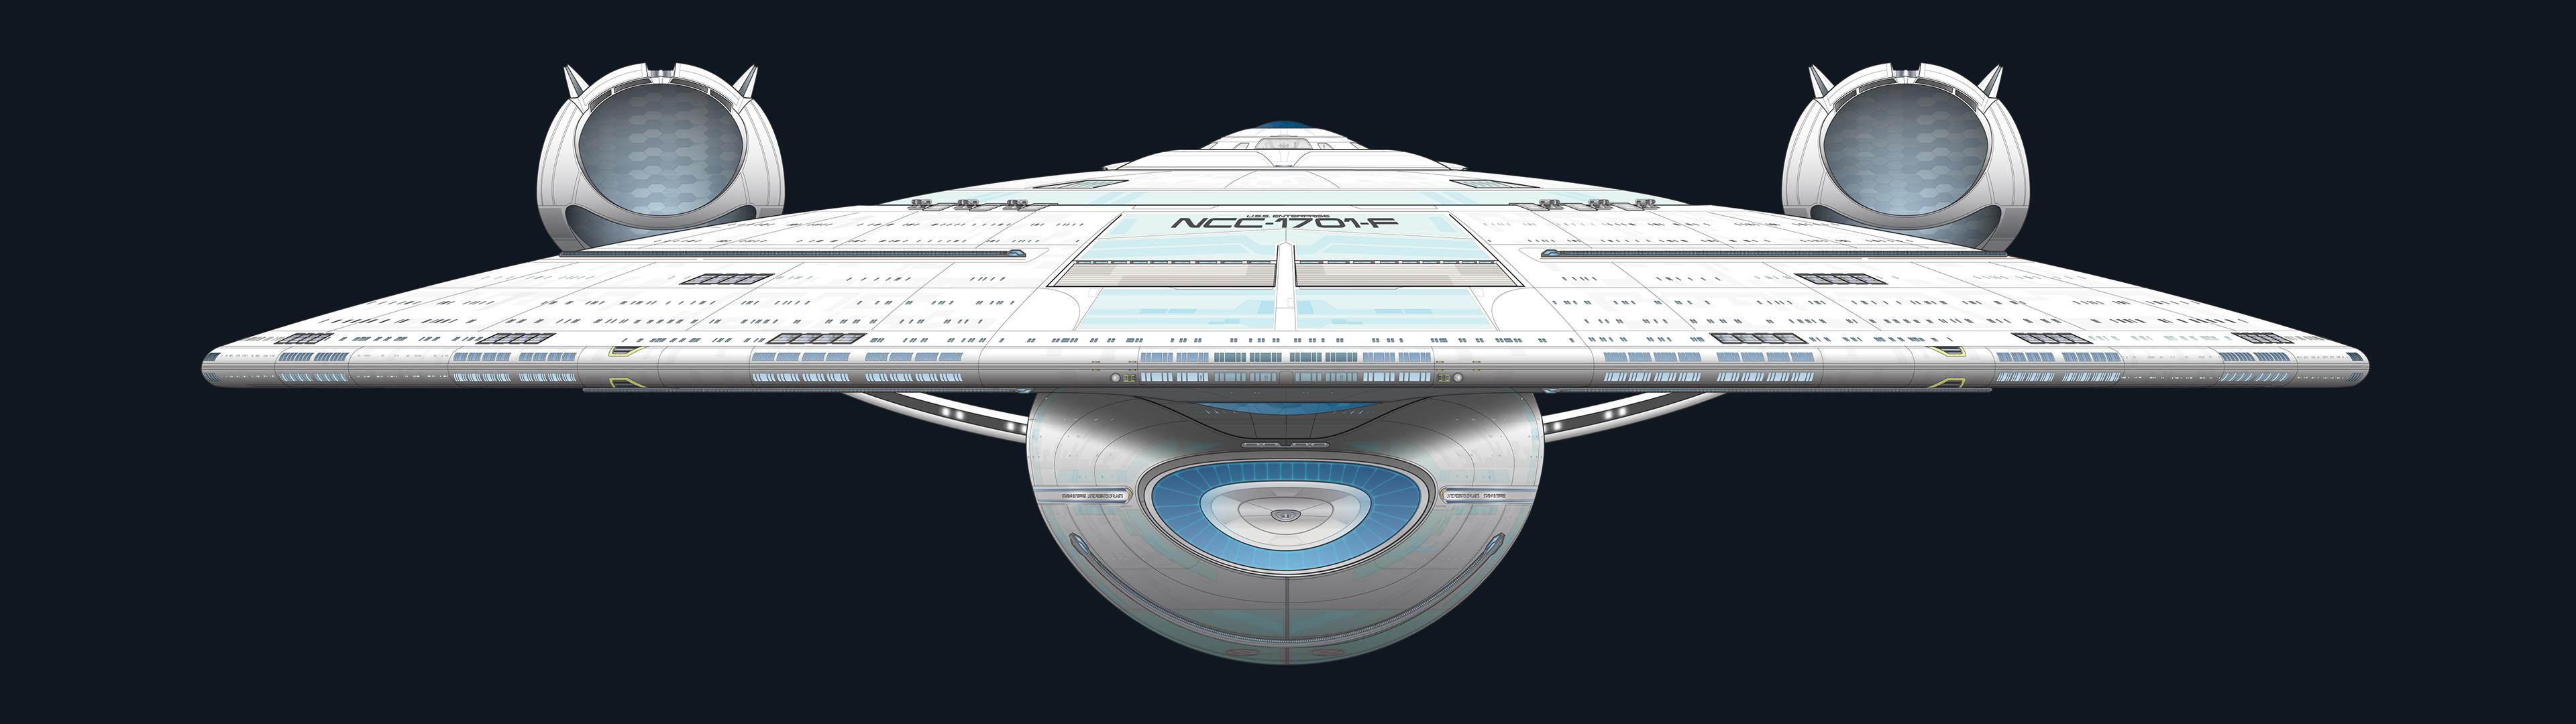 Video Game – Star Trek Online Wallpaper